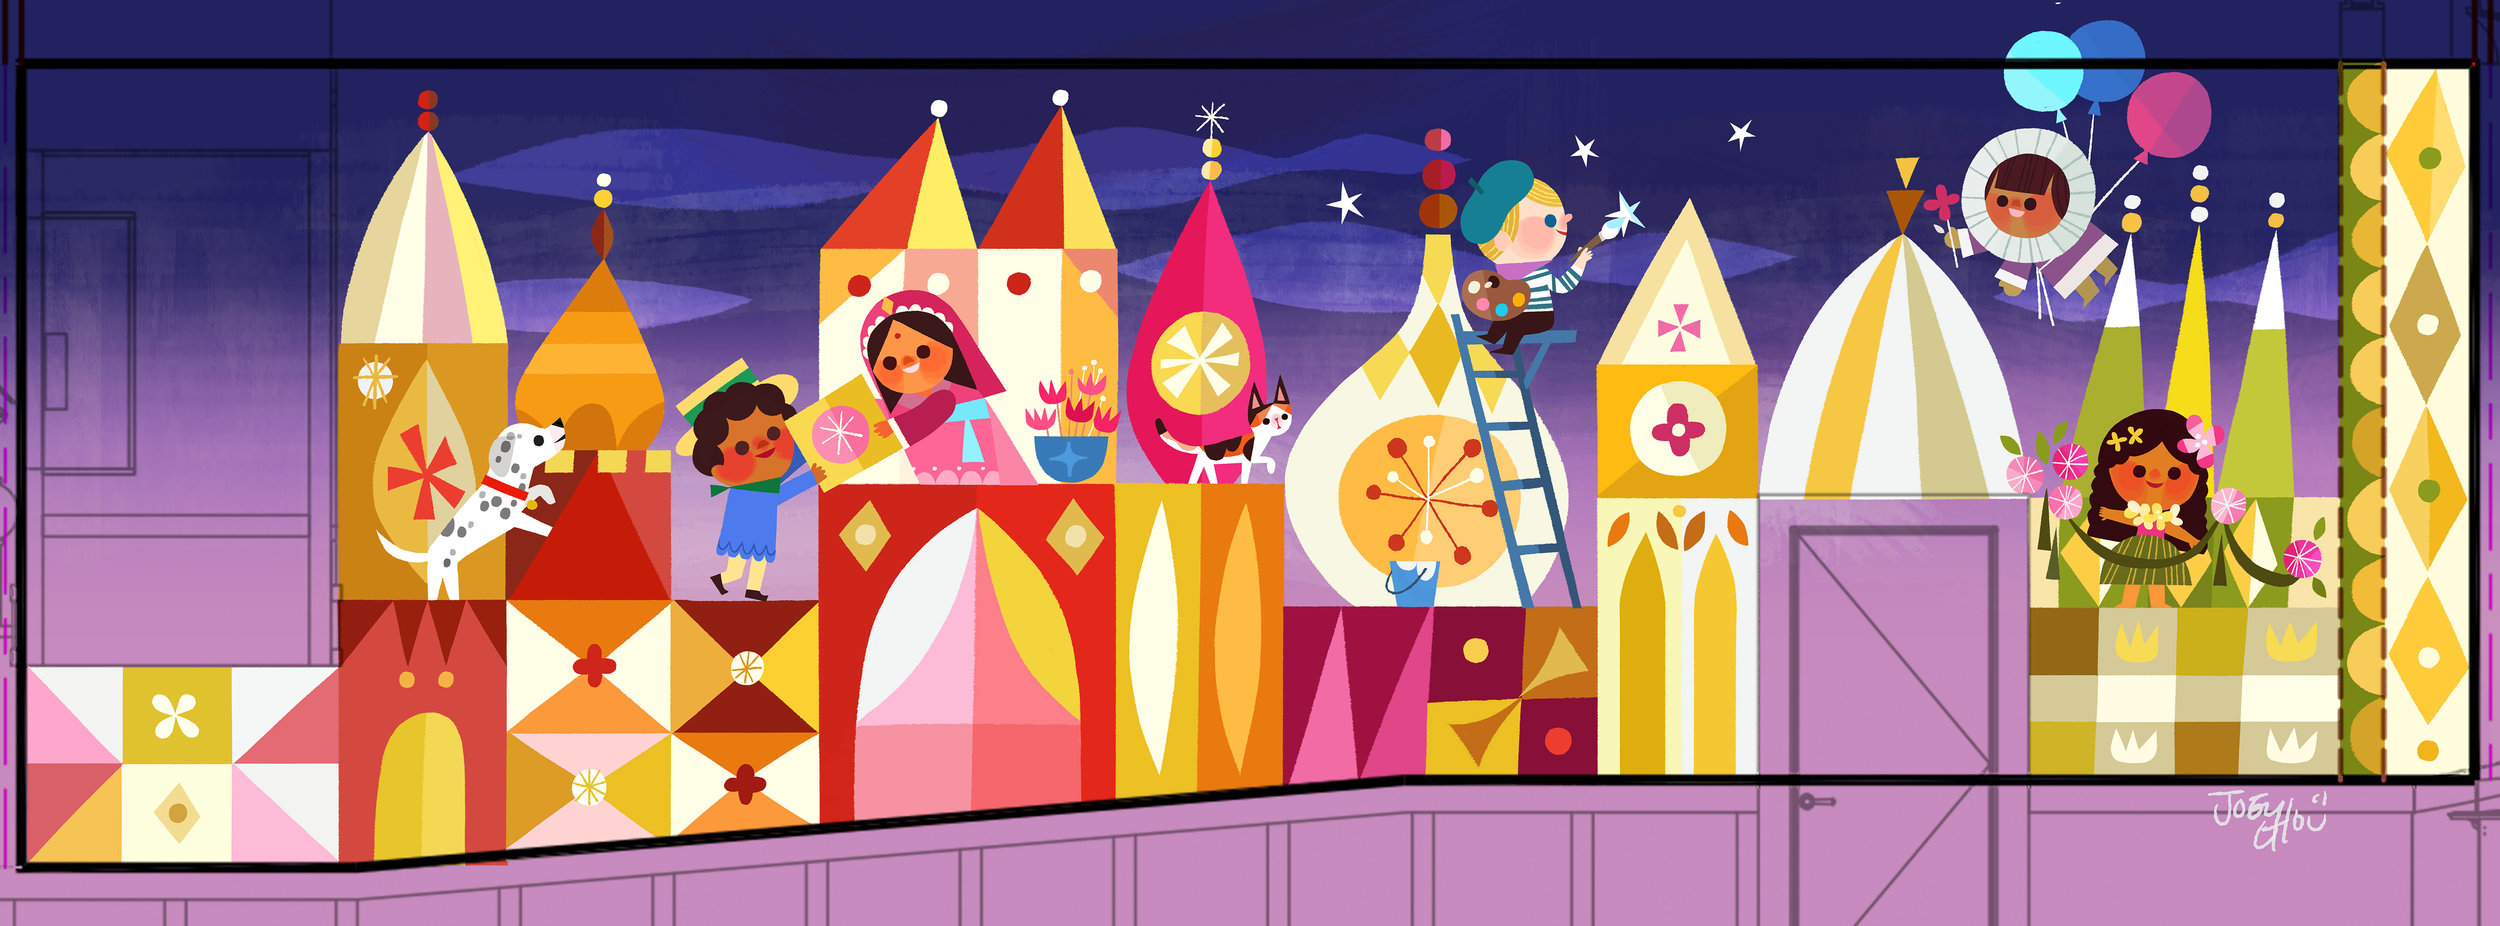 last_mural_color_1_jchou_revised_web.jpg